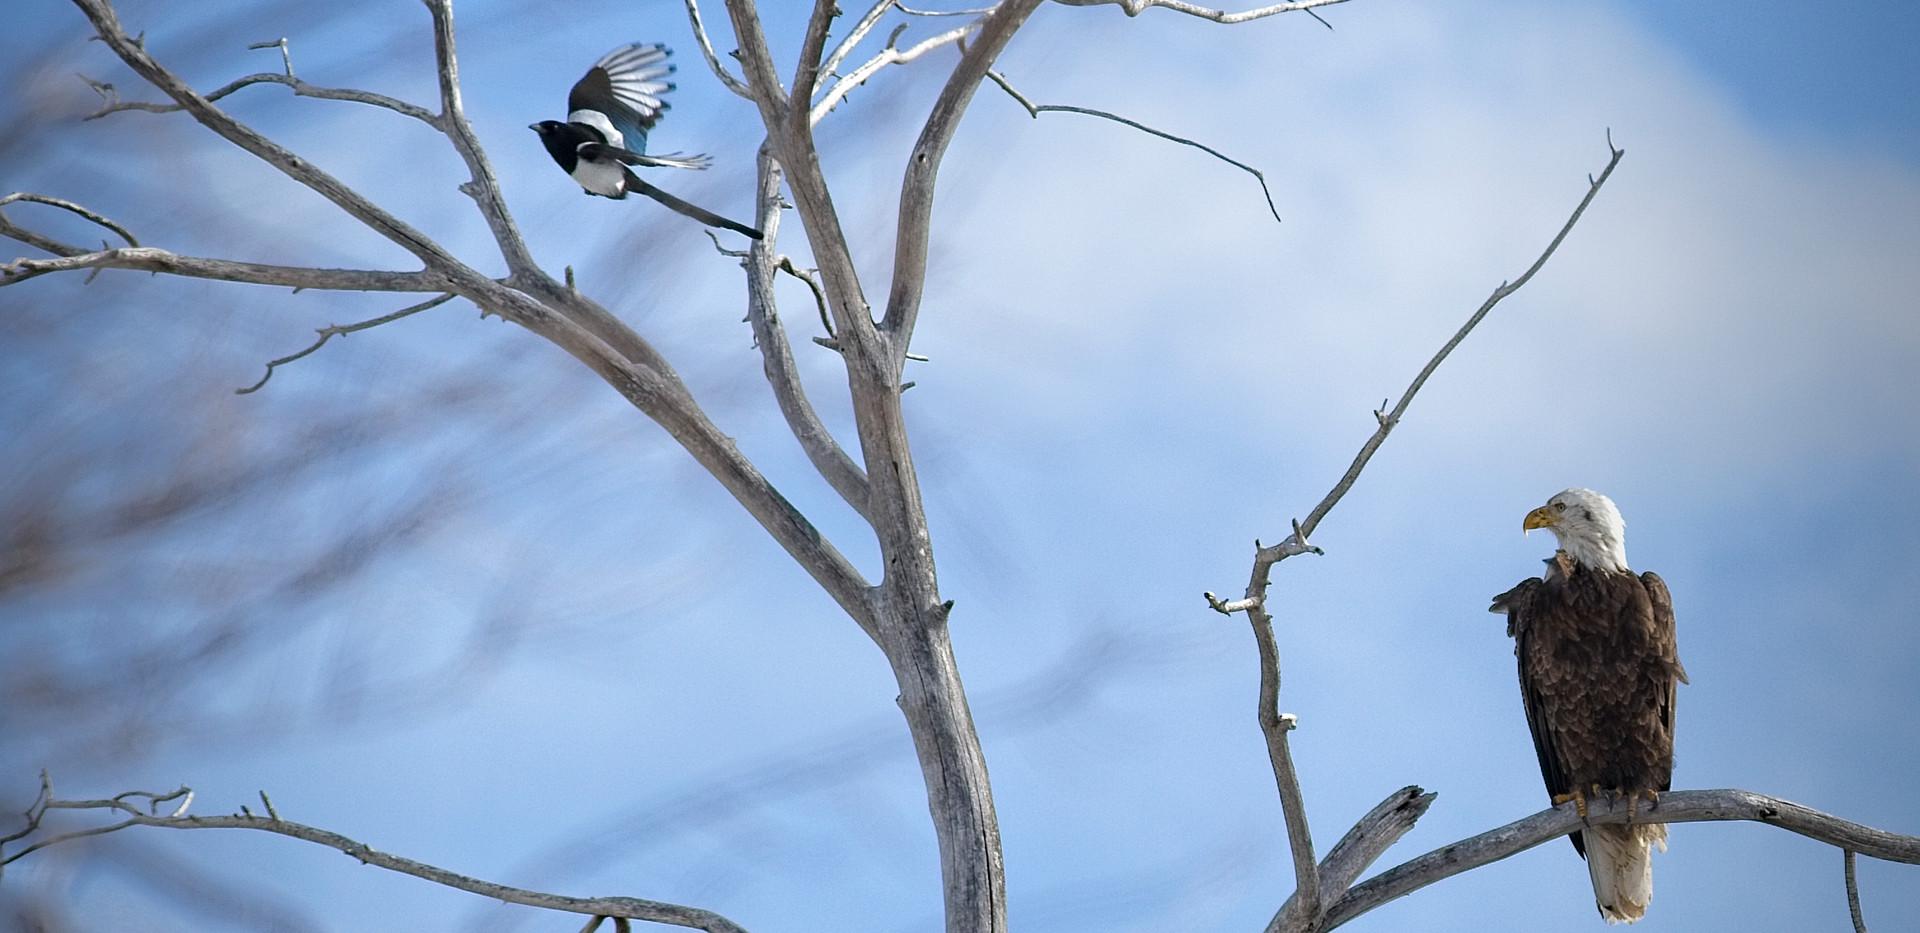 _MG_5843_Cheyenne Zoo_Bald Eagle and Mag